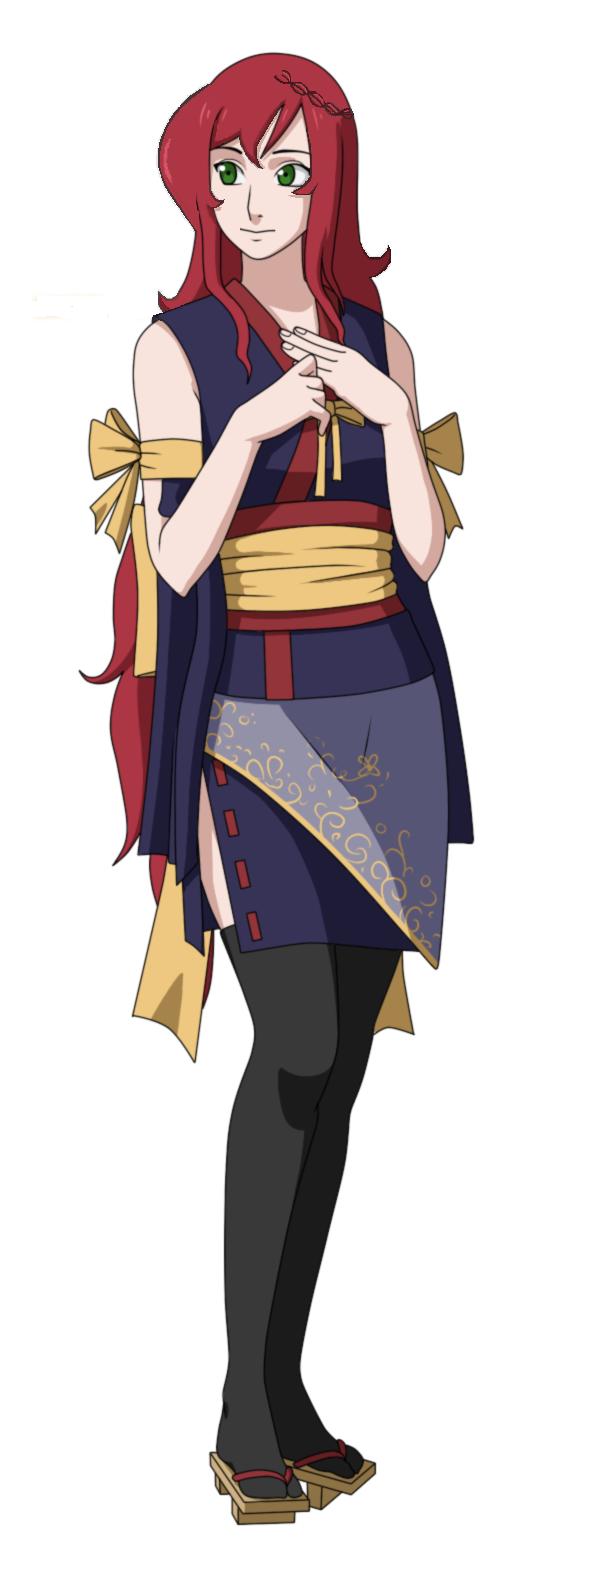 Kaede Uchiha   Naruto Profile Wiki   Fandom powered by Wikia